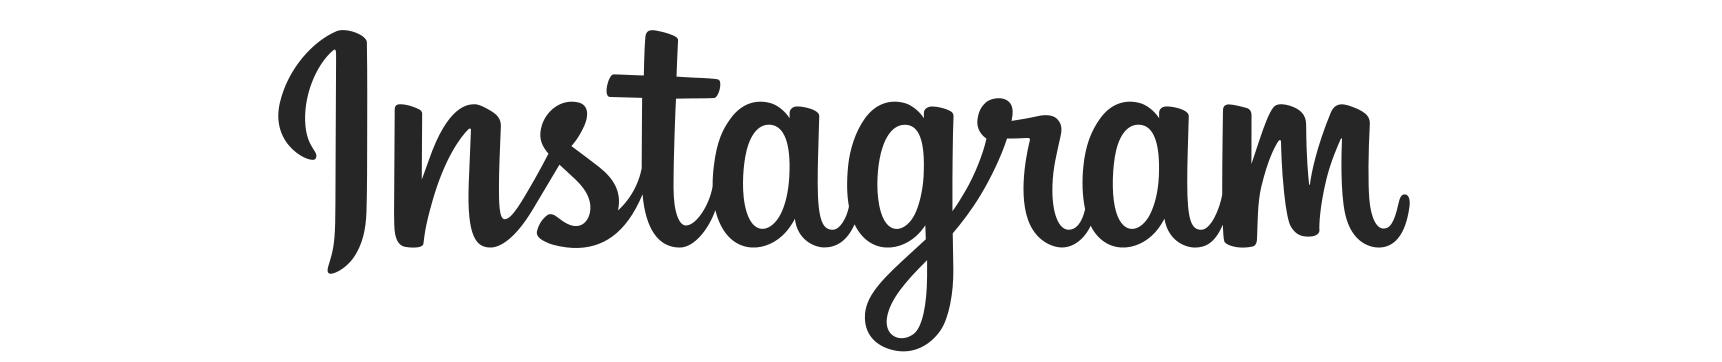 instagram-title